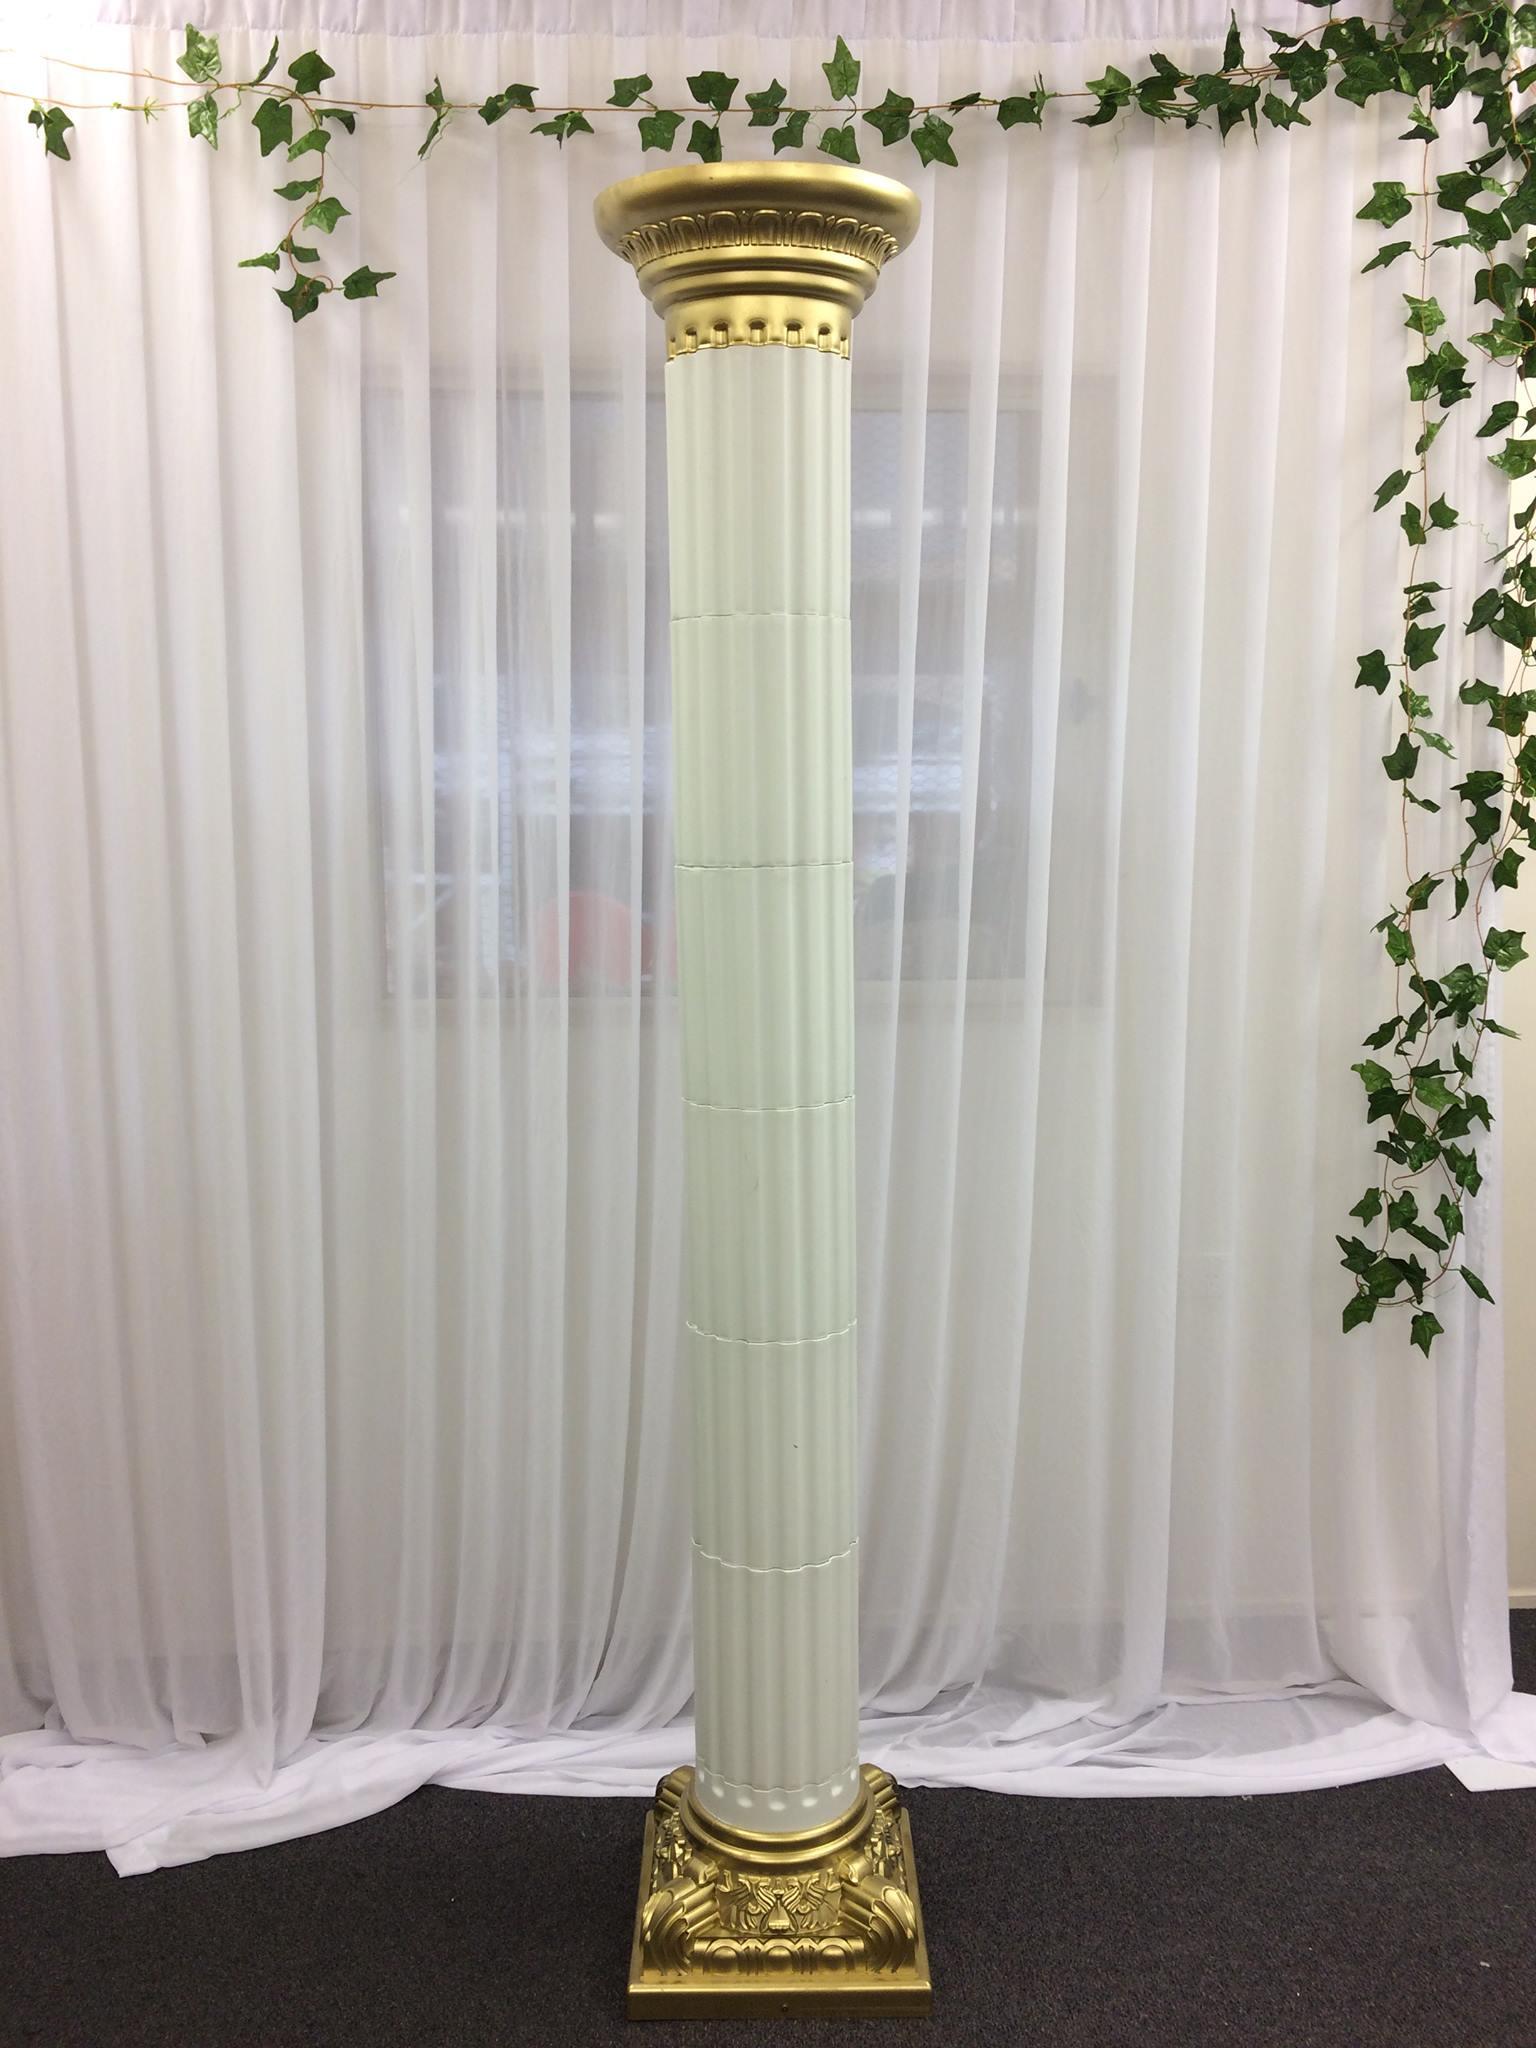 Gold and white roman column